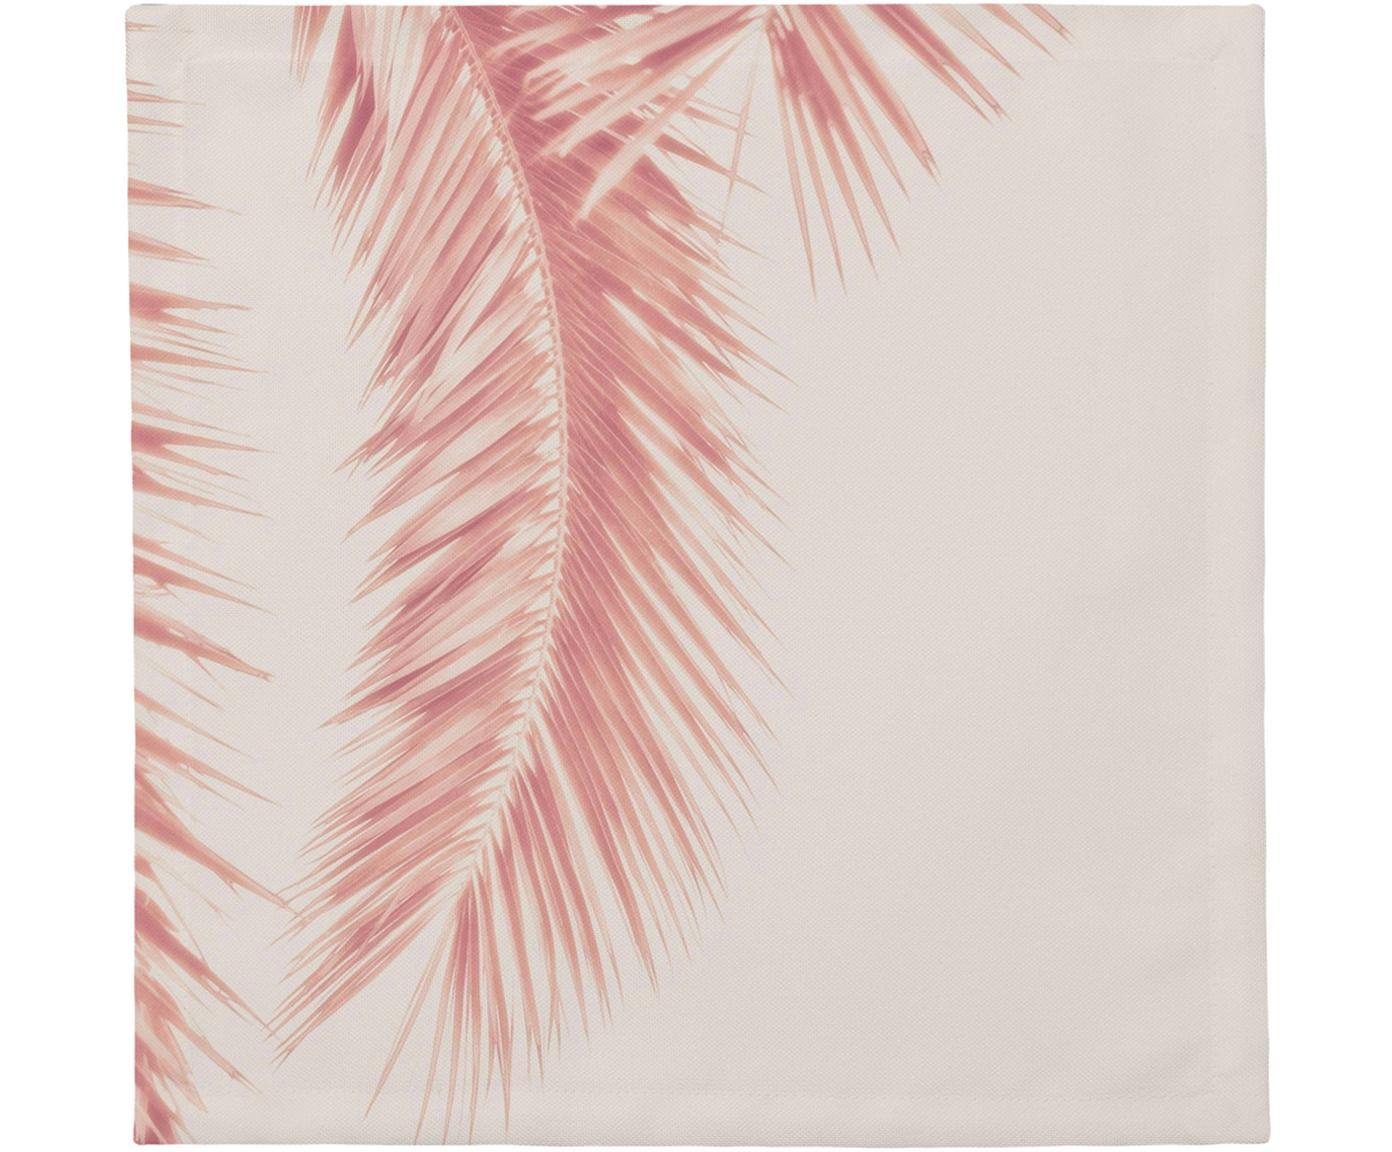 Baumwoll-Servietten Palm Leaves, 4 Stück, Baumwolle, Rosatöne, 40 x 40 cm